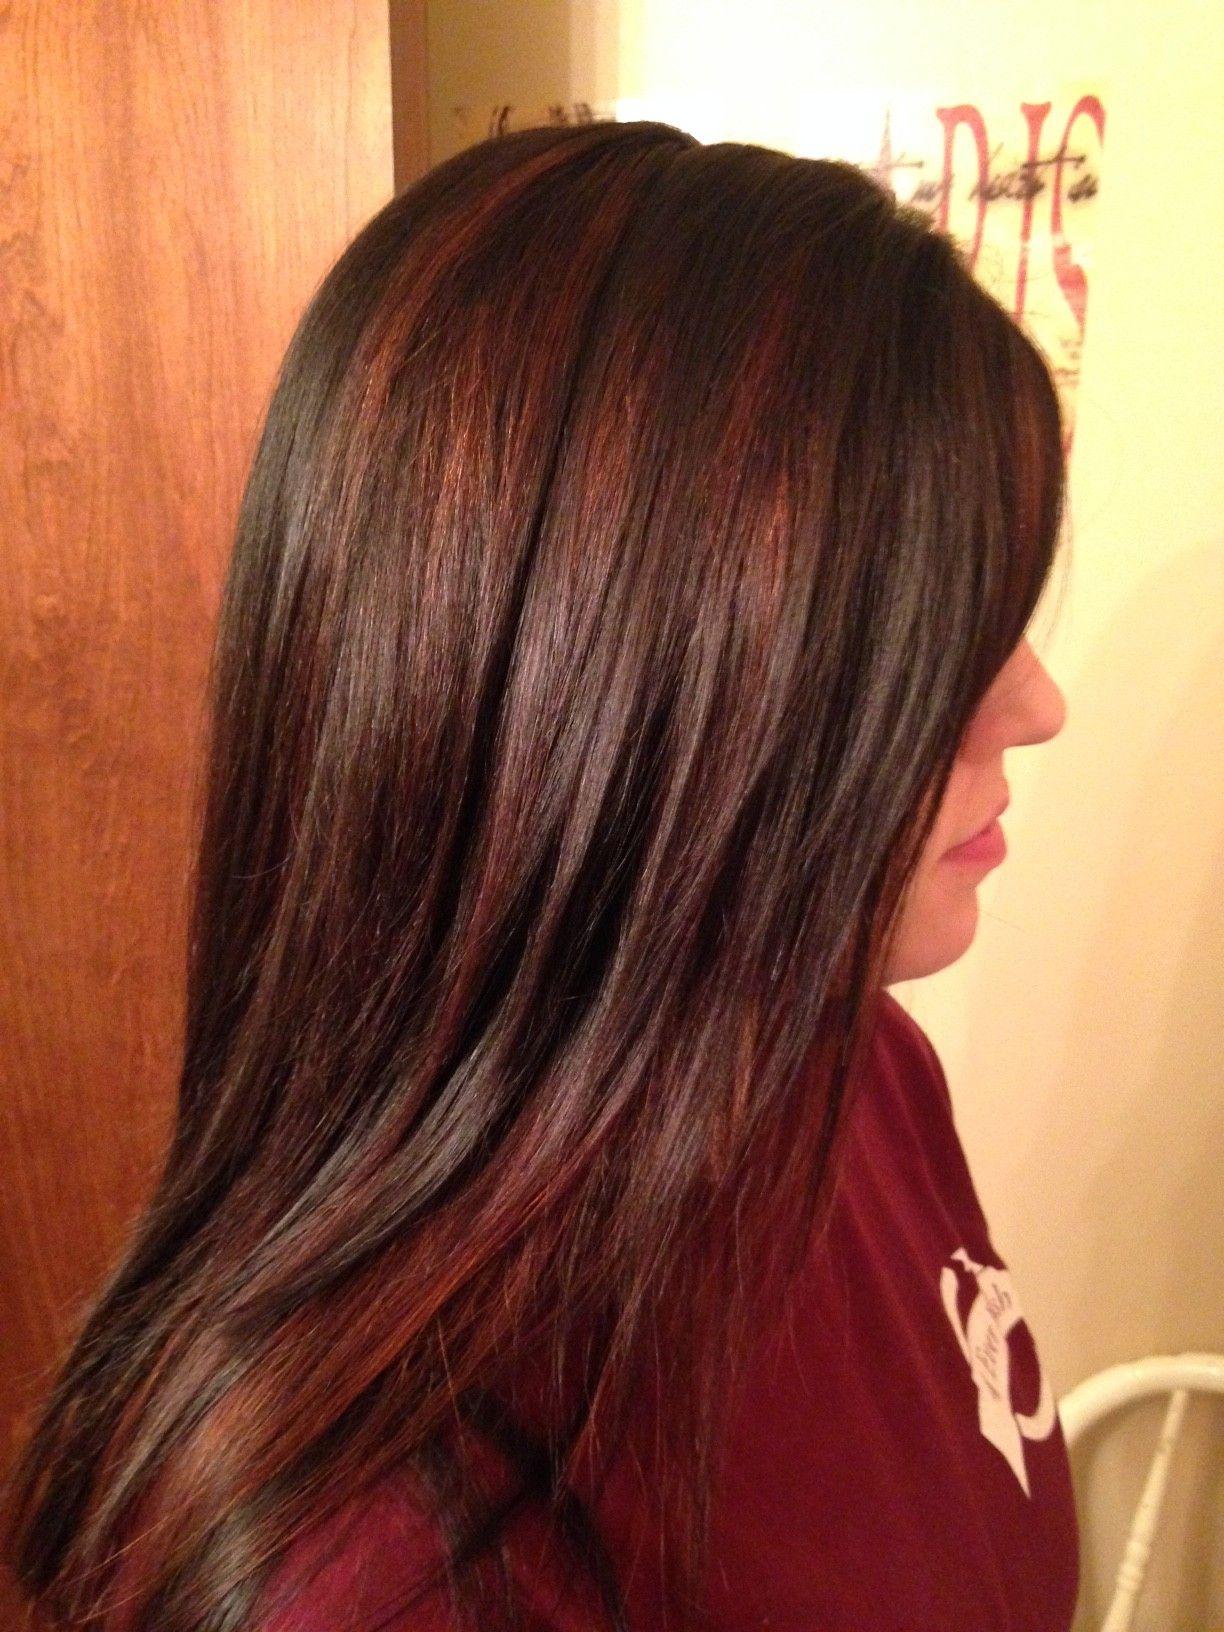 Img 7270 E1412731428219 Jpg 1224 1632 Red Highlights In Brown Hair Red Brown Hair Brunette Hair Color